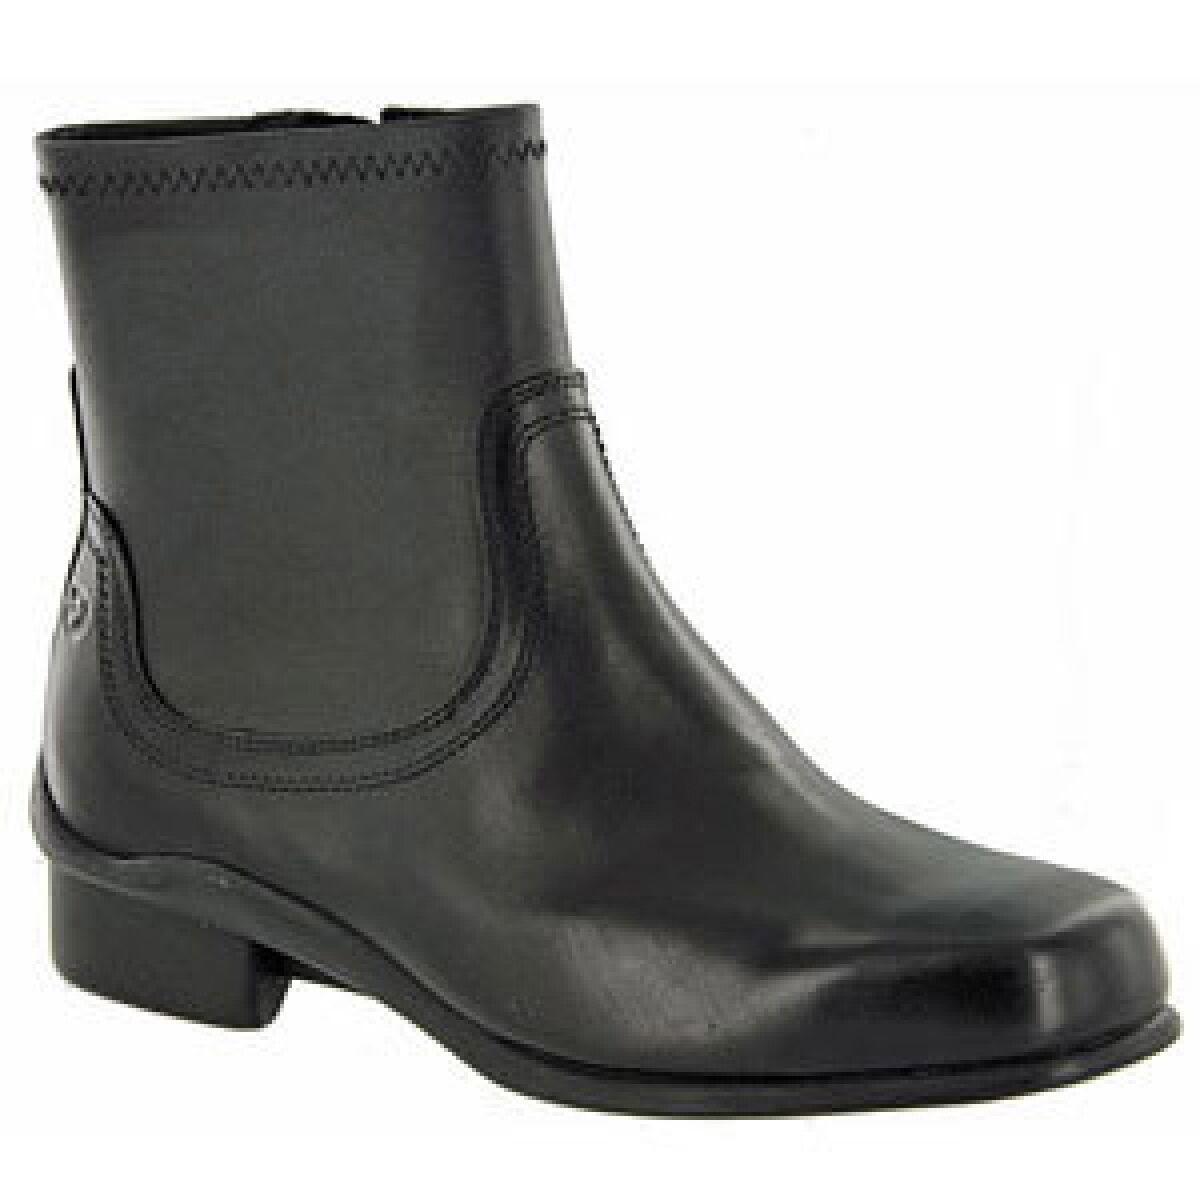 Aravon Erin WOE06BK Black Ankle Boots 6.5 B